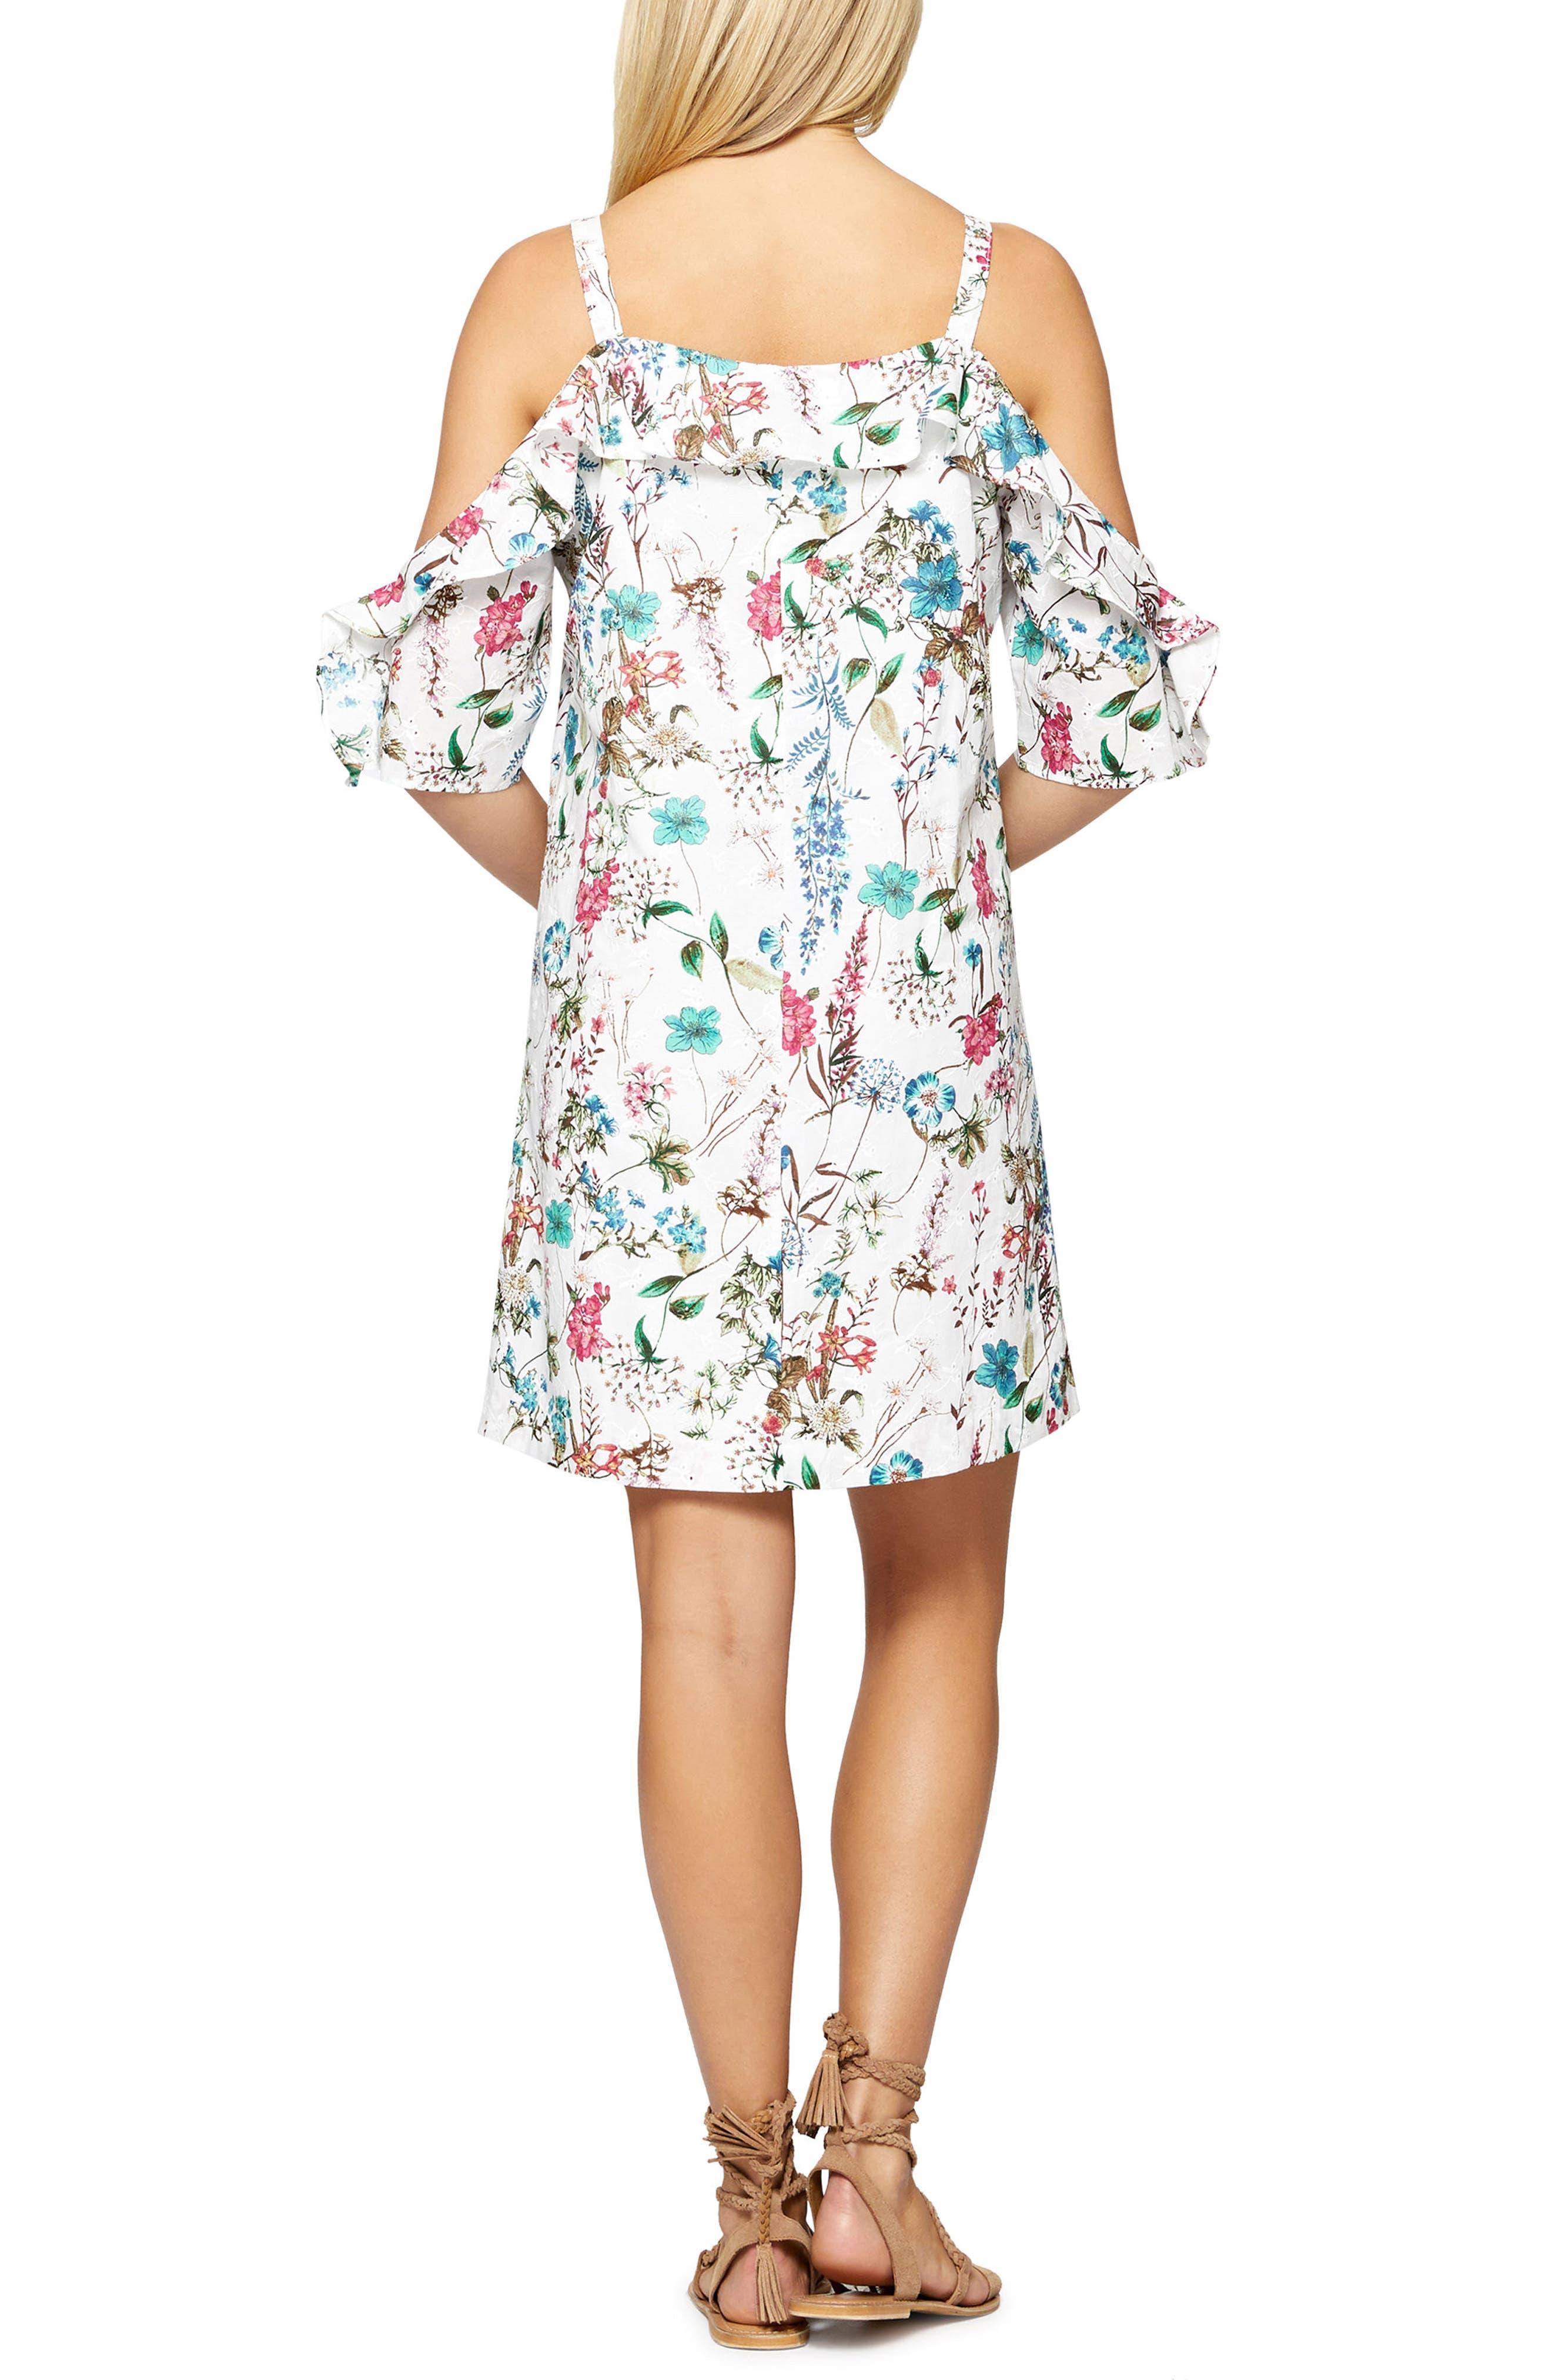 Primrose Ruffle Cold Shoulder Dress,                             Alternate thumbnail 2, color,                             192